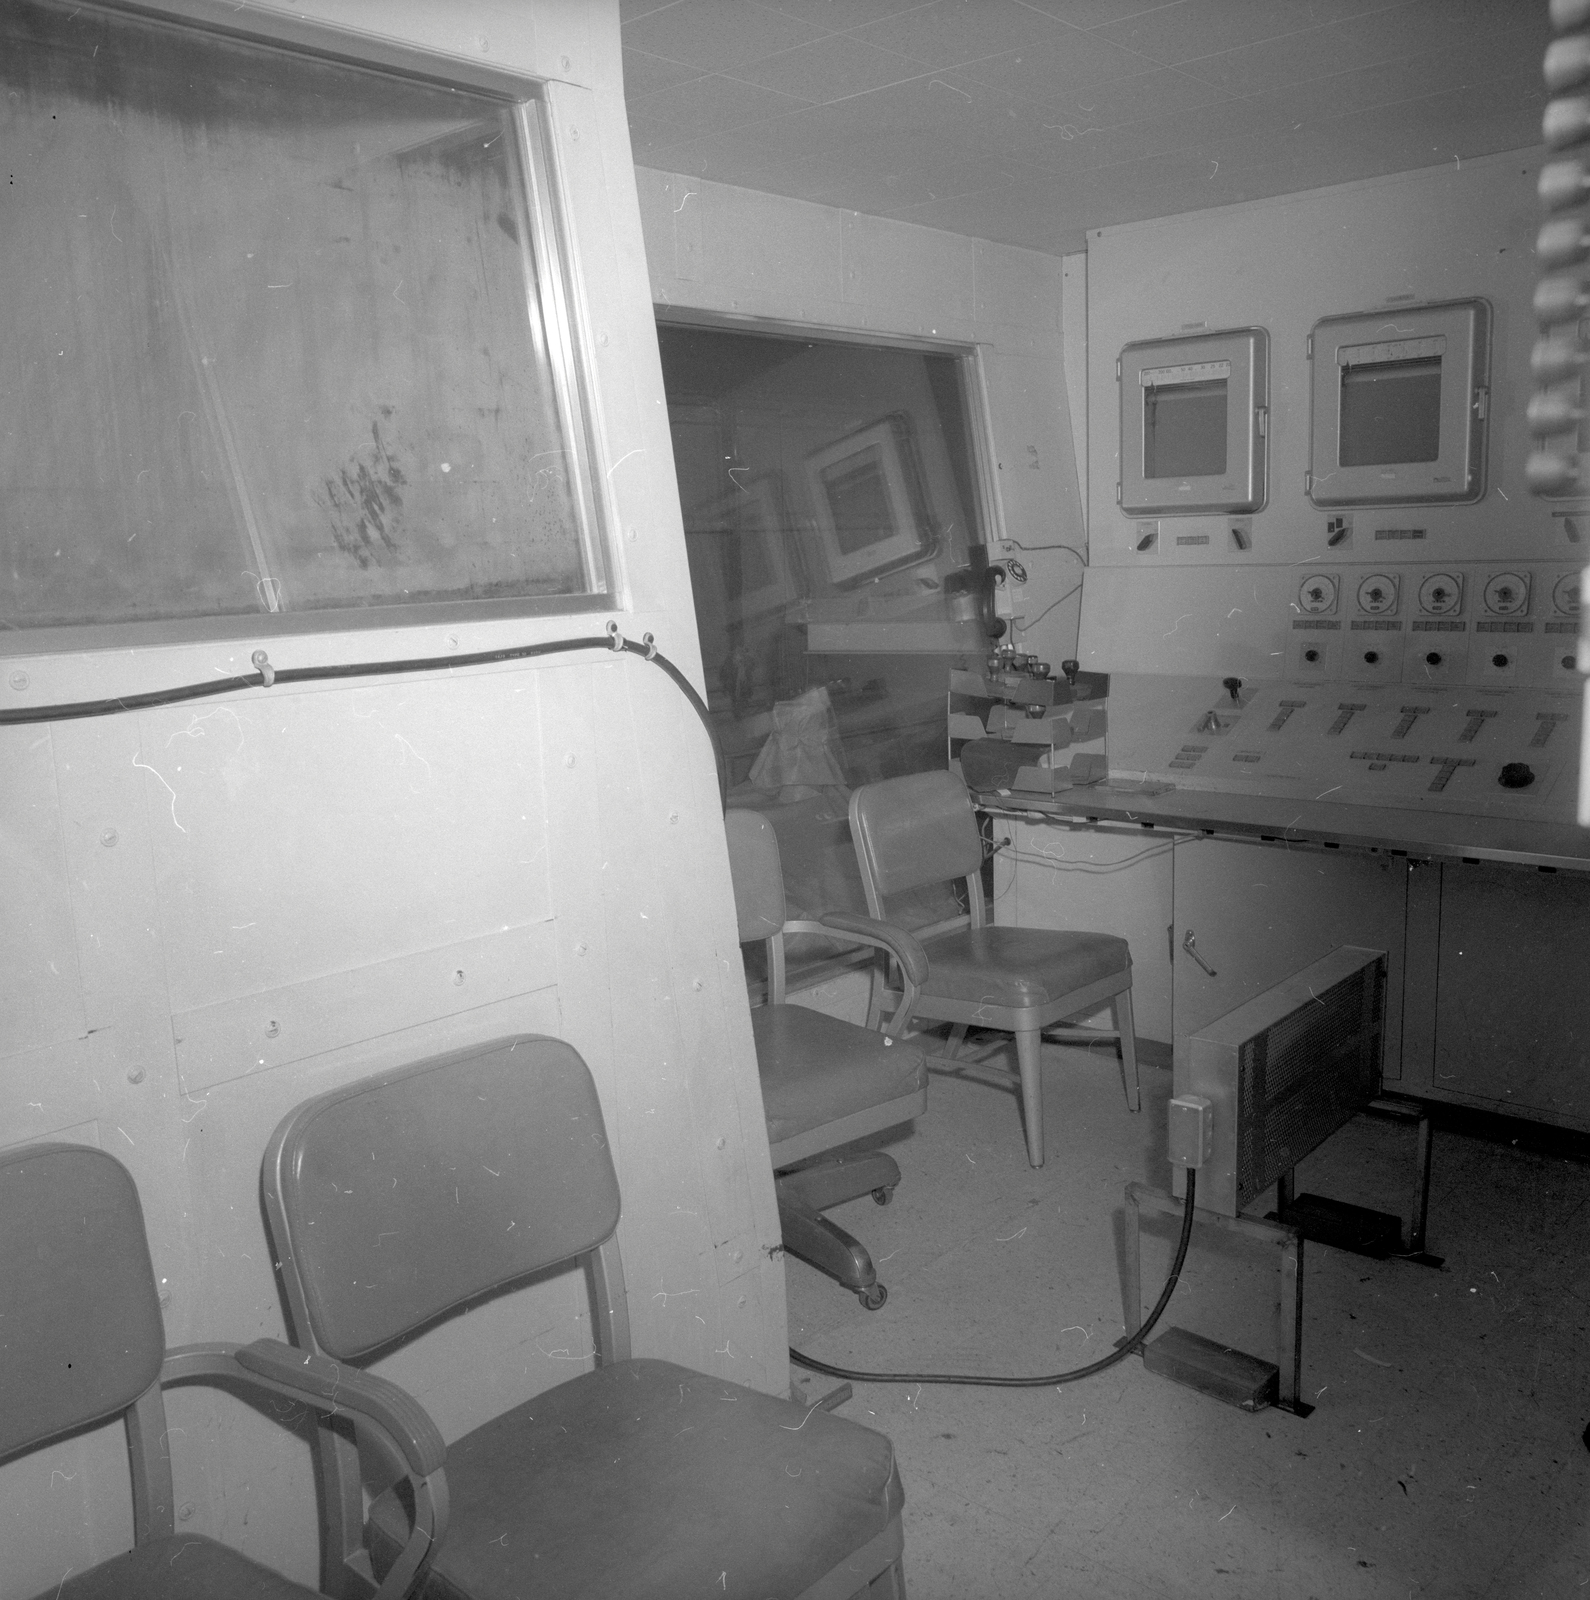 NASA PLUM BROOK NUCLEAR REACTOR DECOMMISSIONING